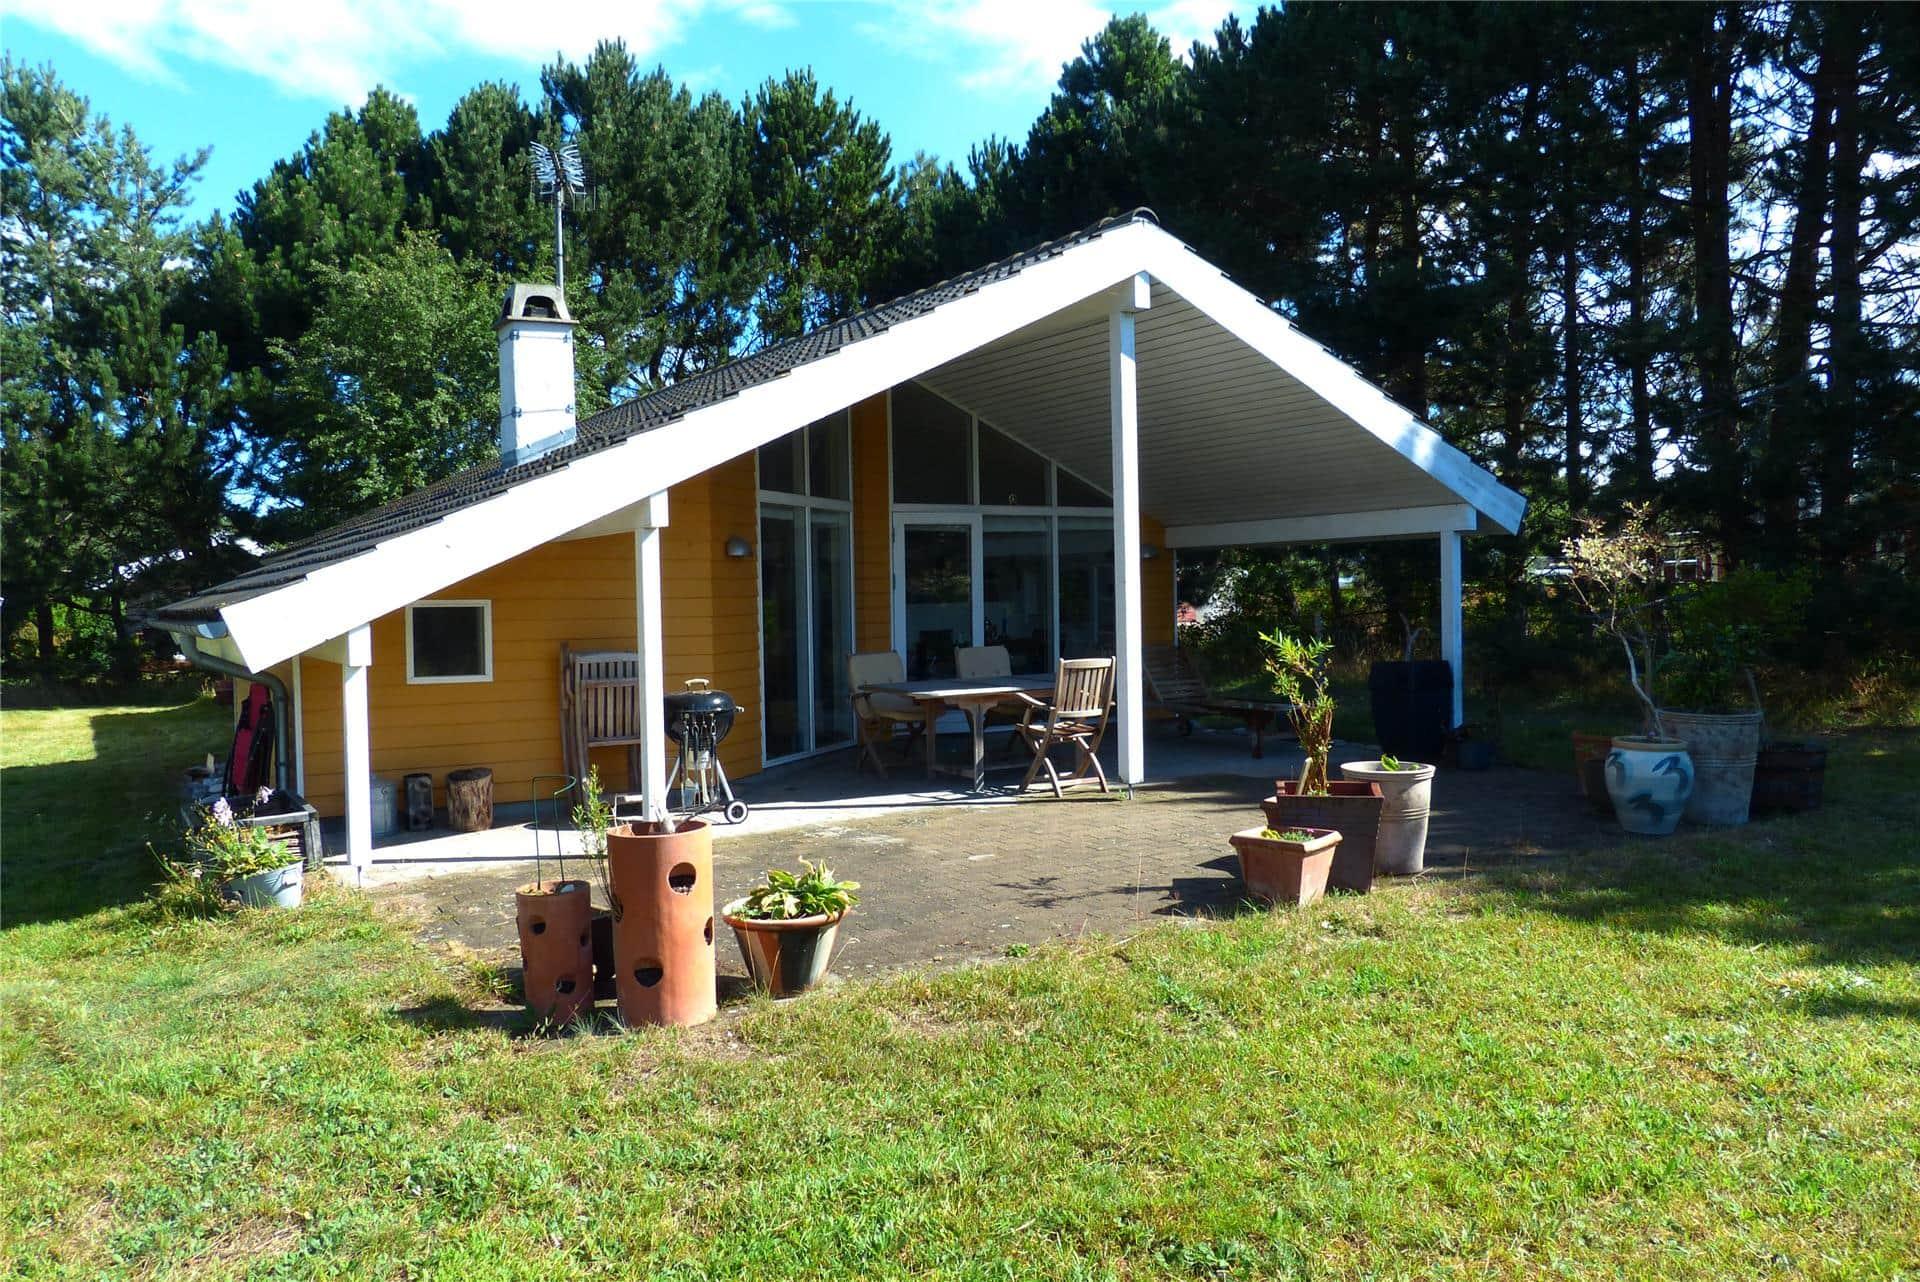 Afbeelding 1-17 Vakantiehuis 11133, Bregnebjergvej 25, DK - 4500 Nykøbing Sj